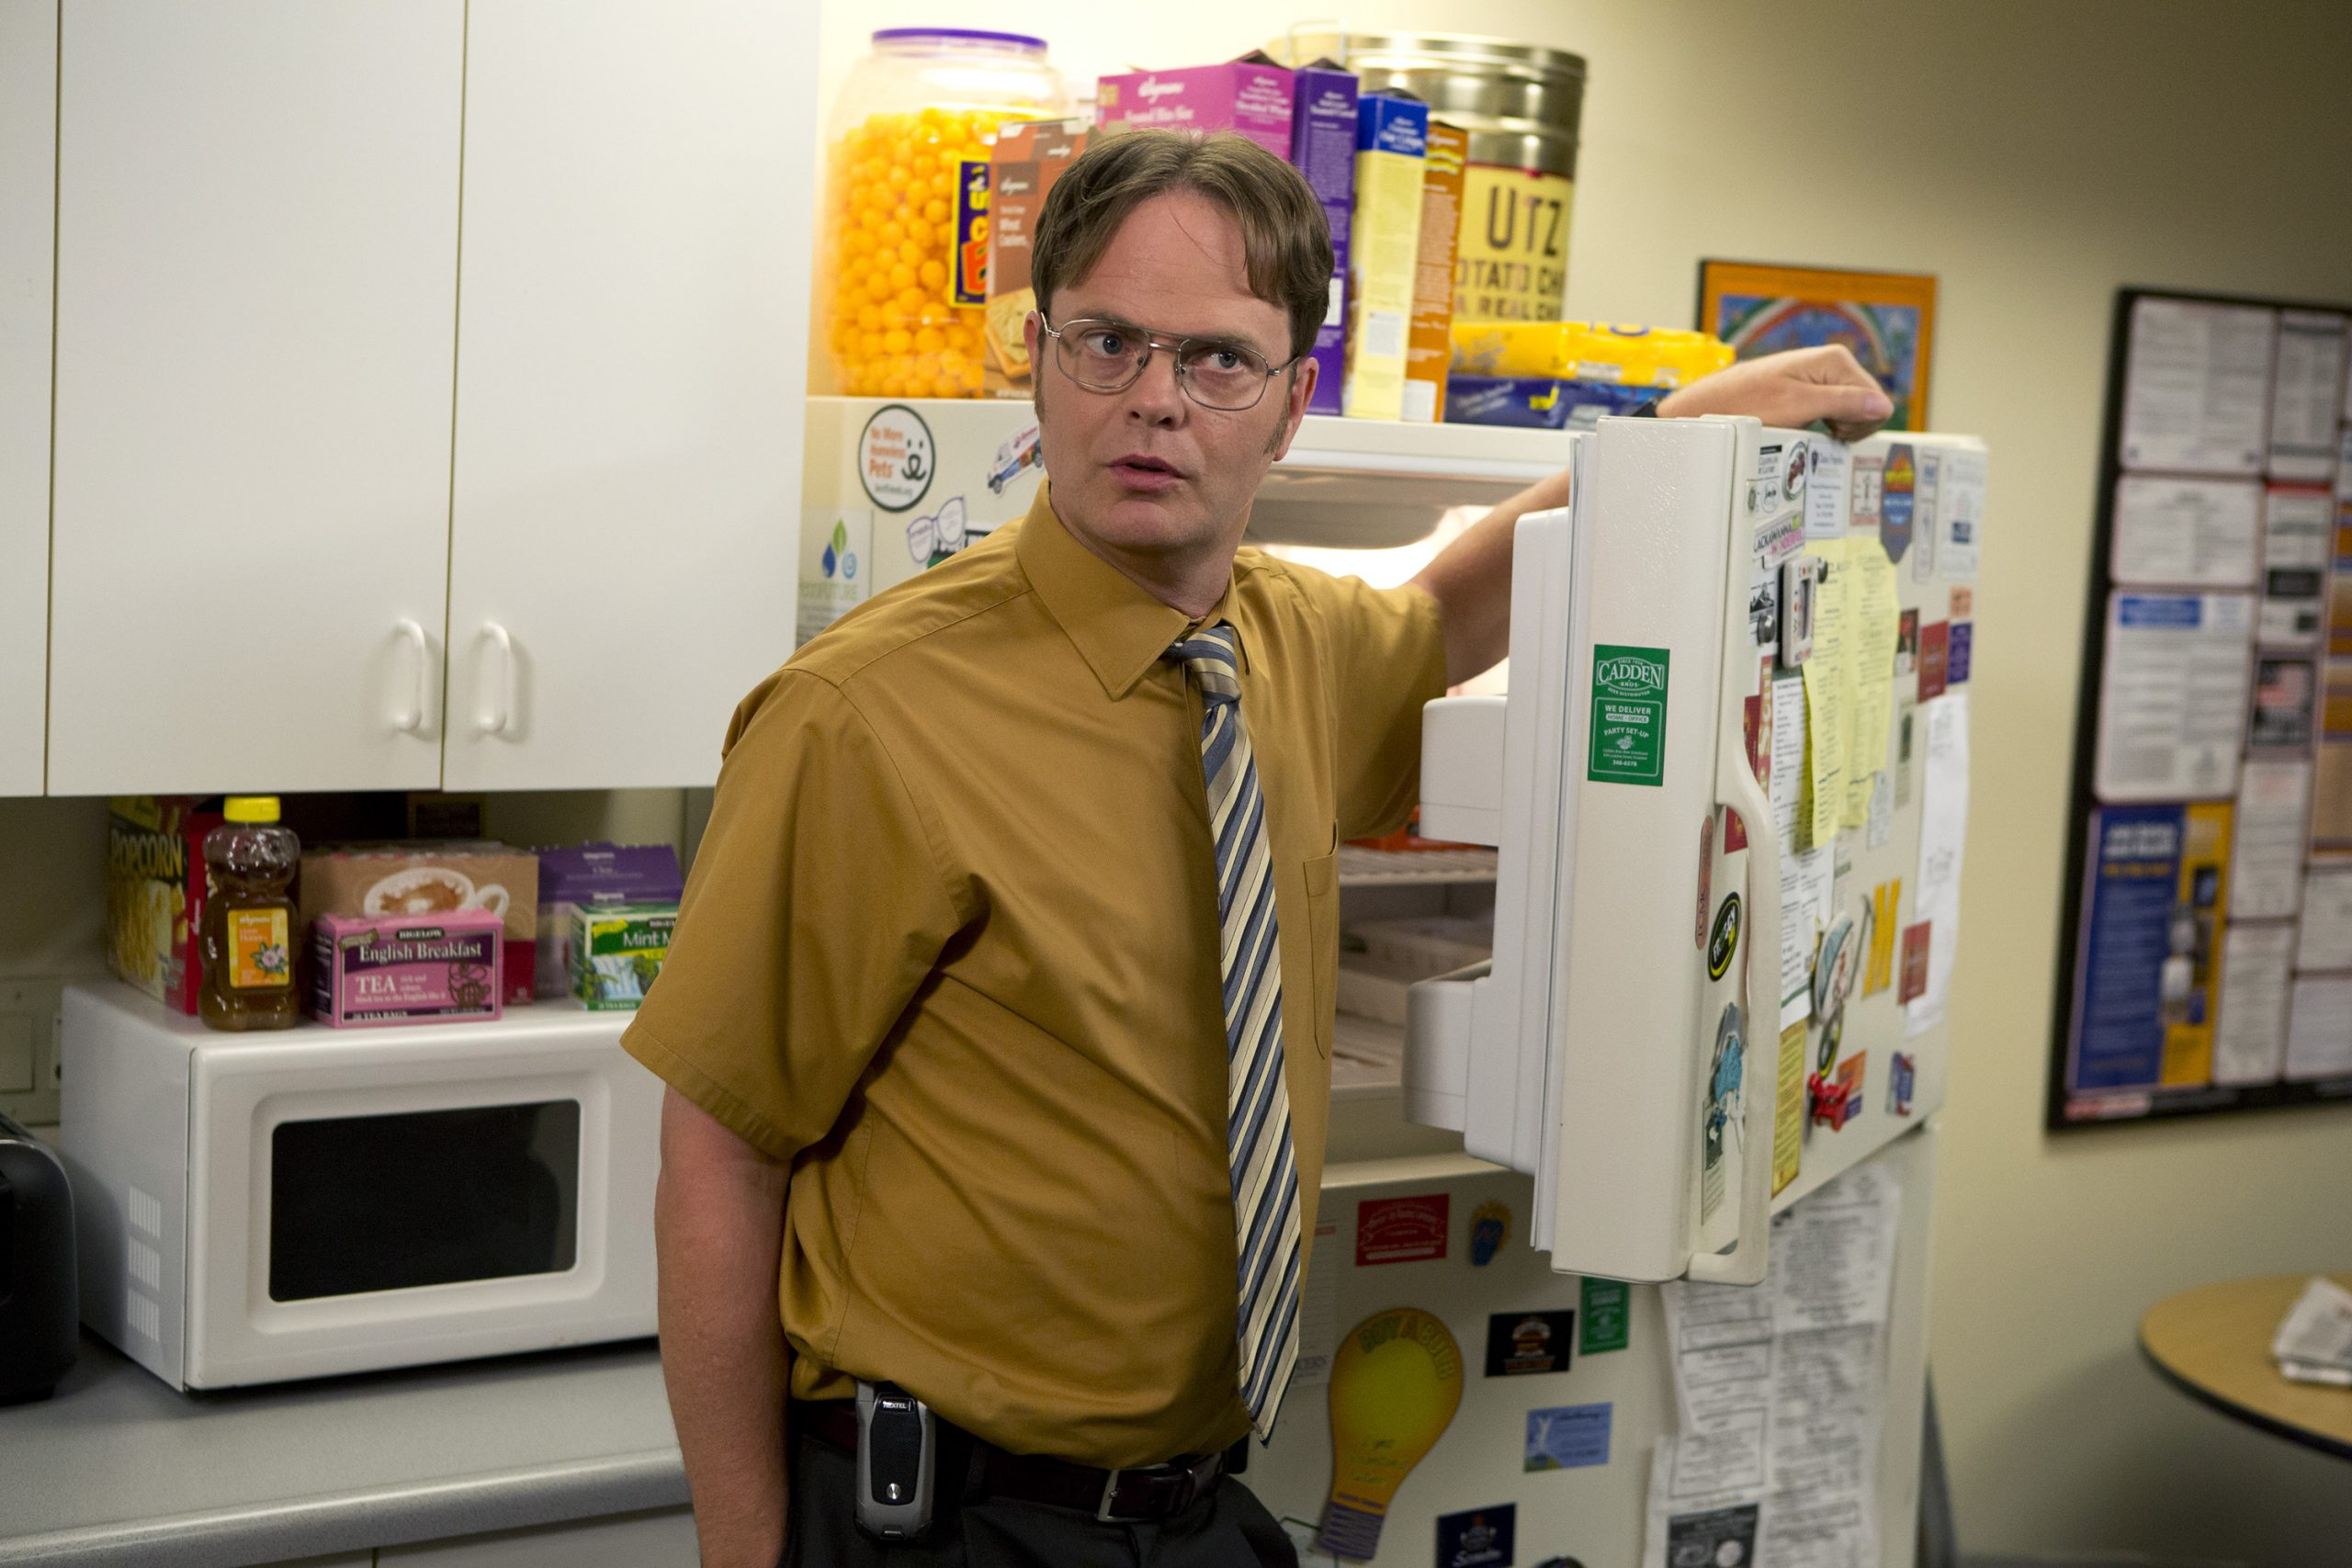 'The Office': 1 Emotional Moment Defines the Show for Rainn Wilson